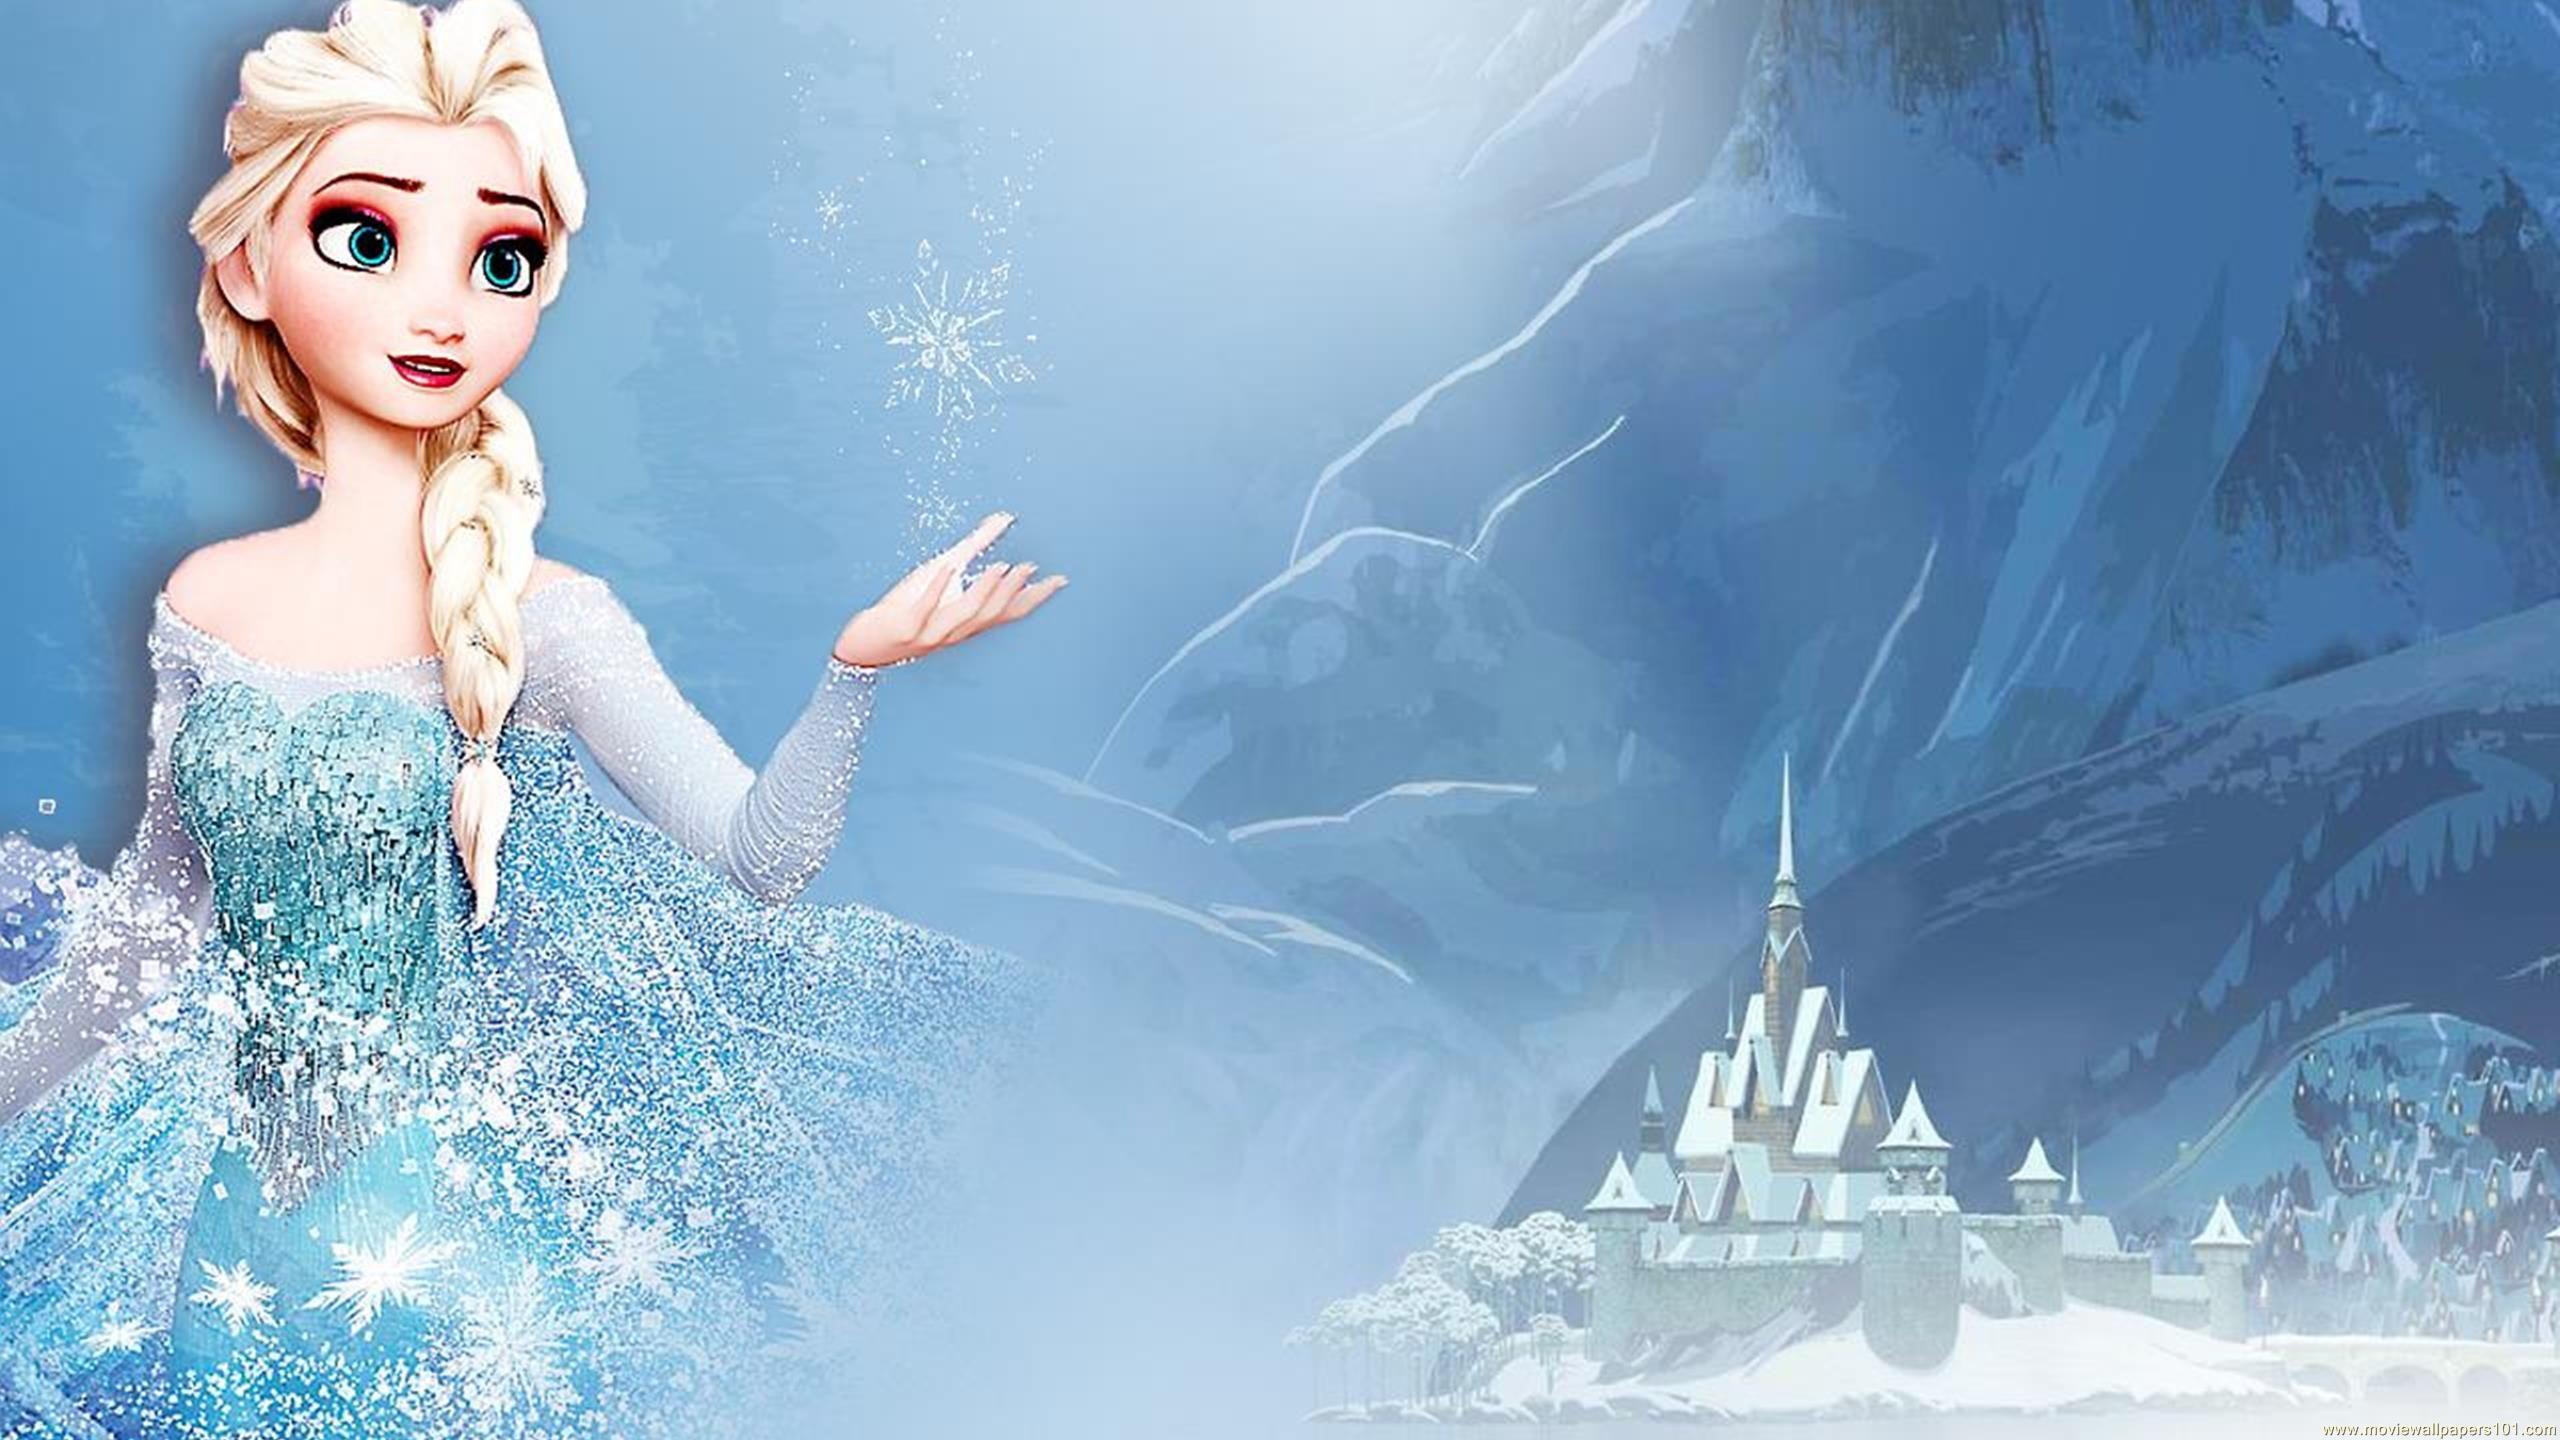 Elsa Wallpaper Frozen hd